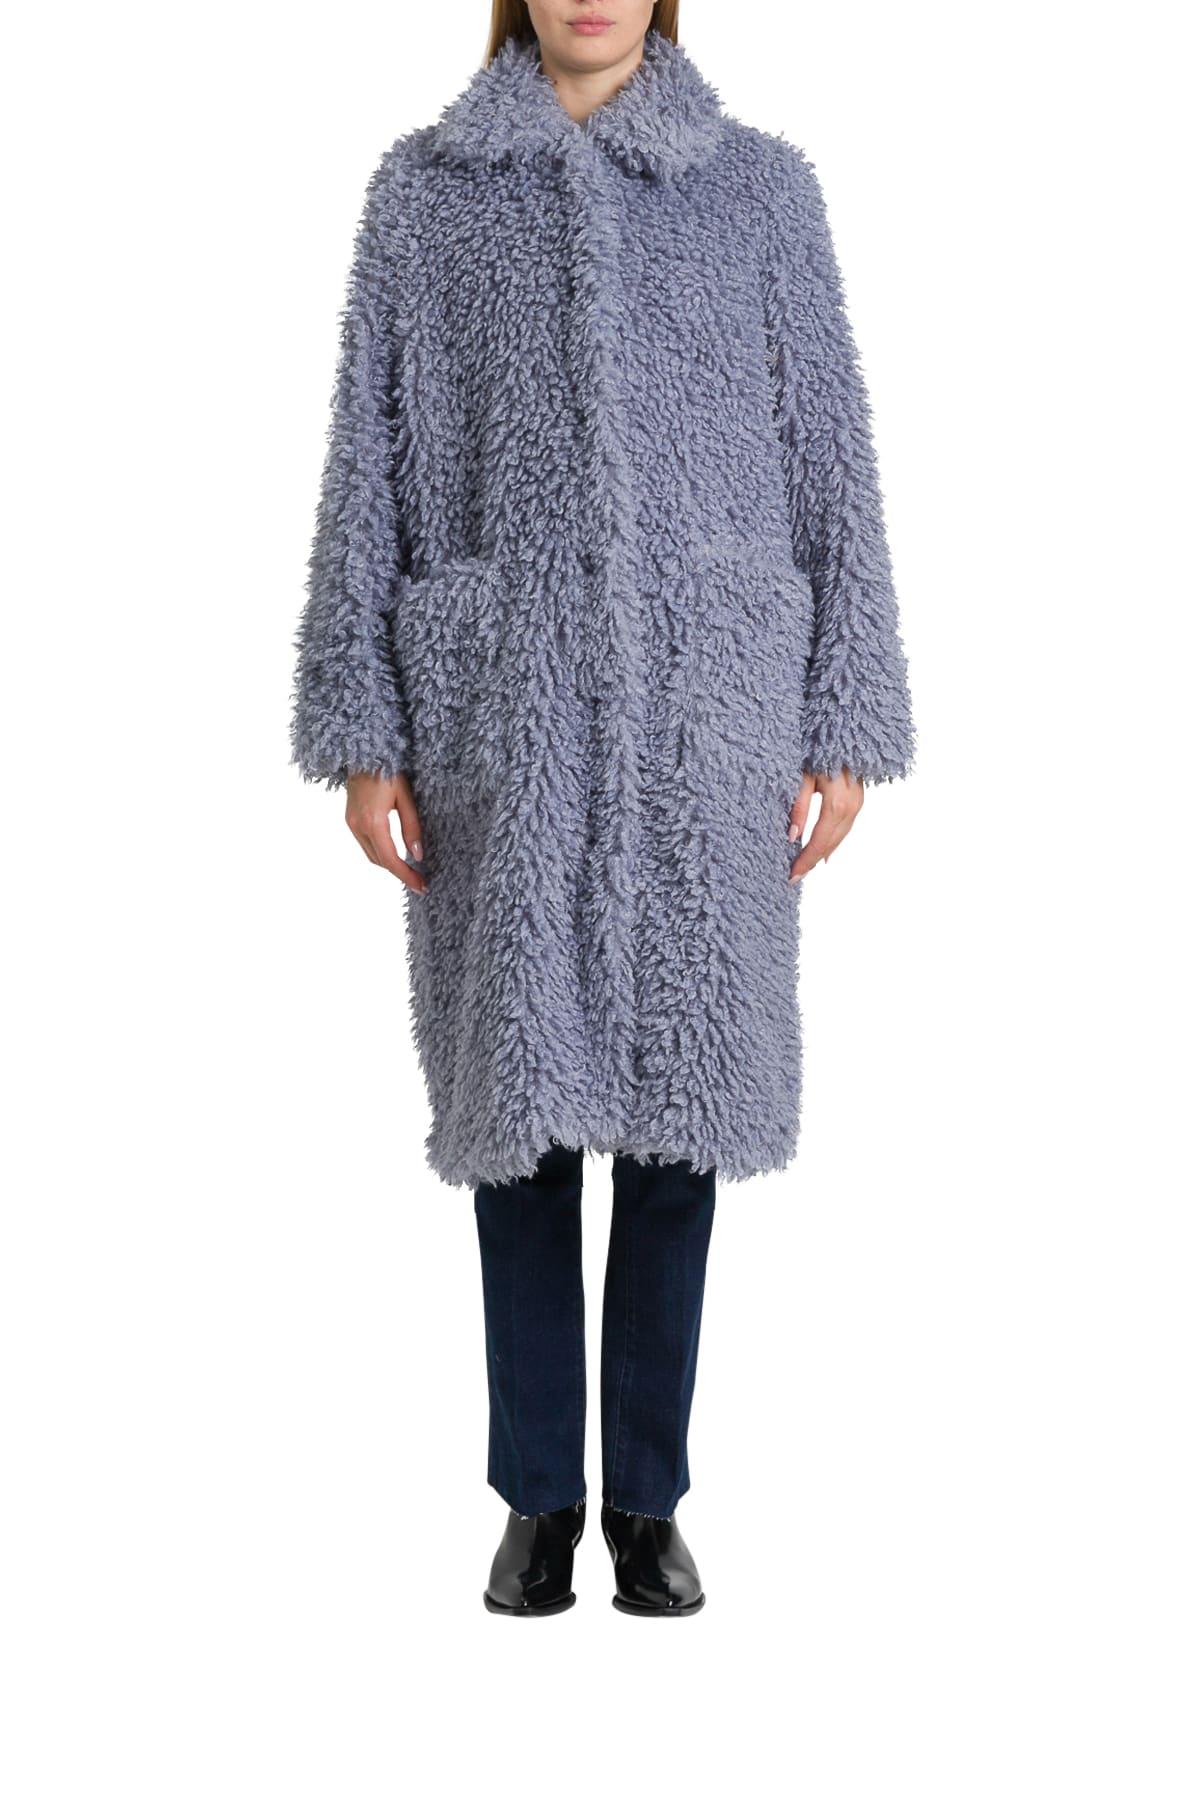 STAND STUDIO Maria Teddy Coat